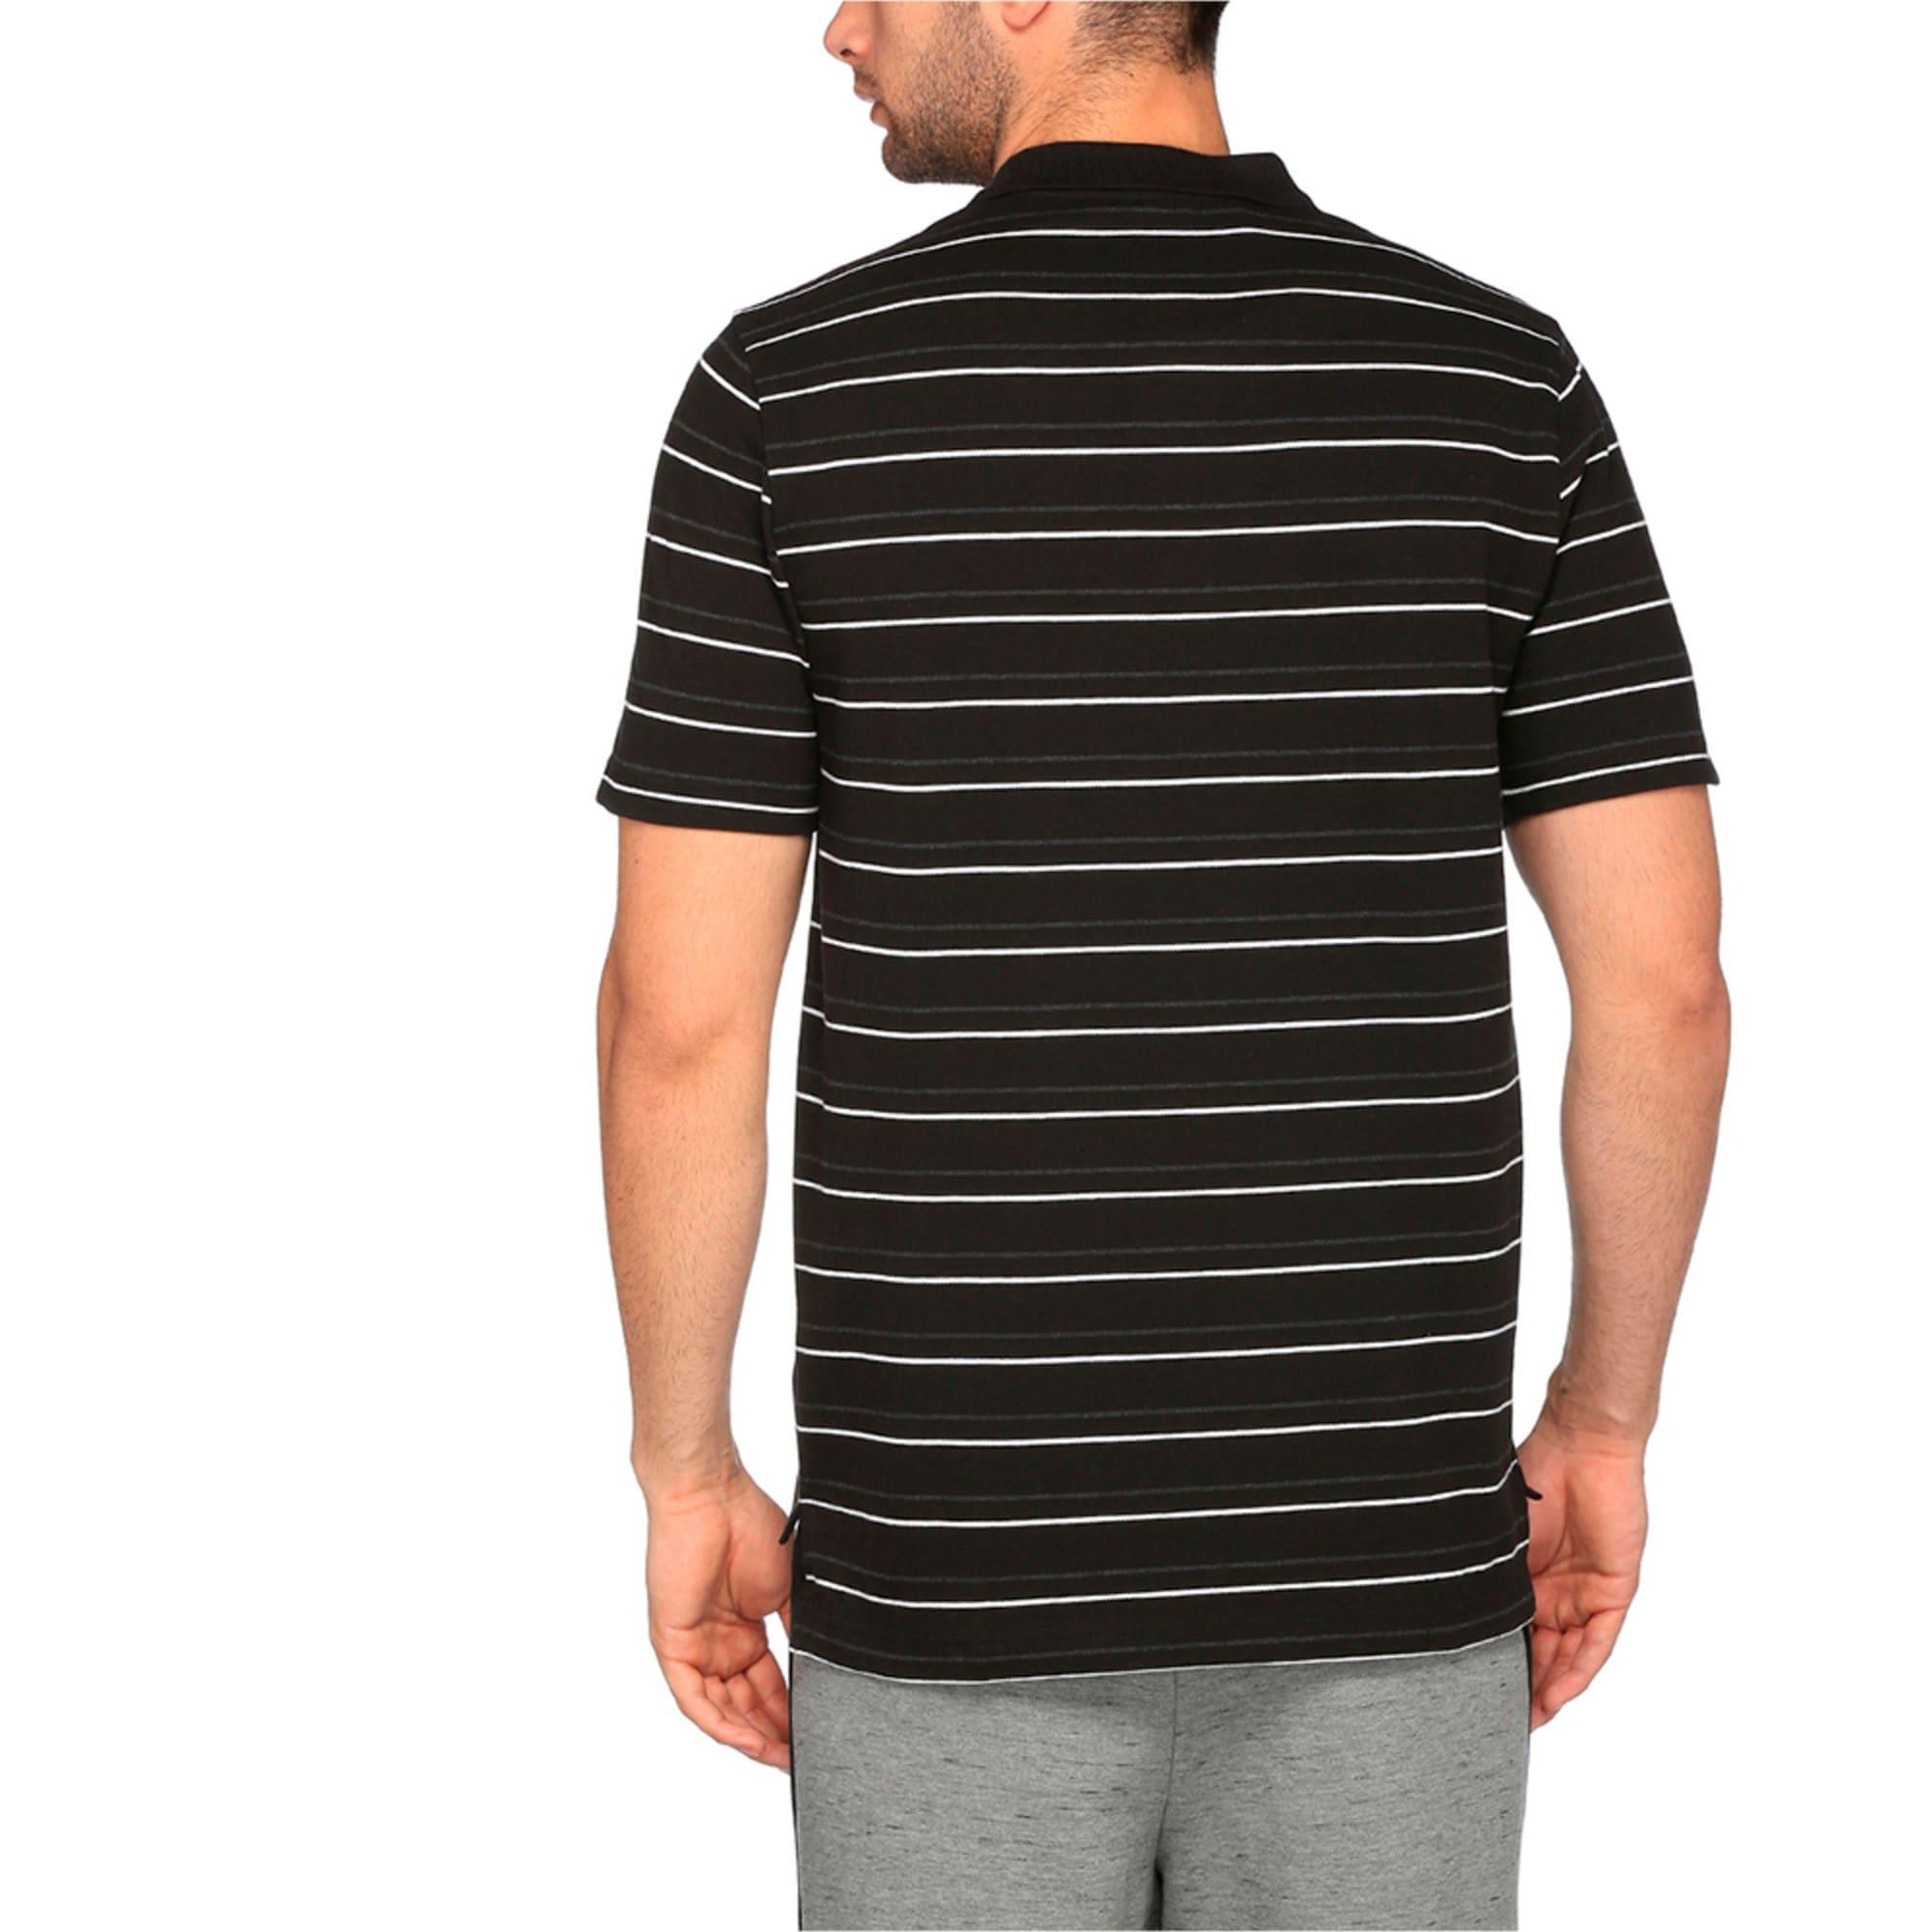 Thumbnail 2 of Sports Stripe Pique Polo, Cotton Black, medium-IND